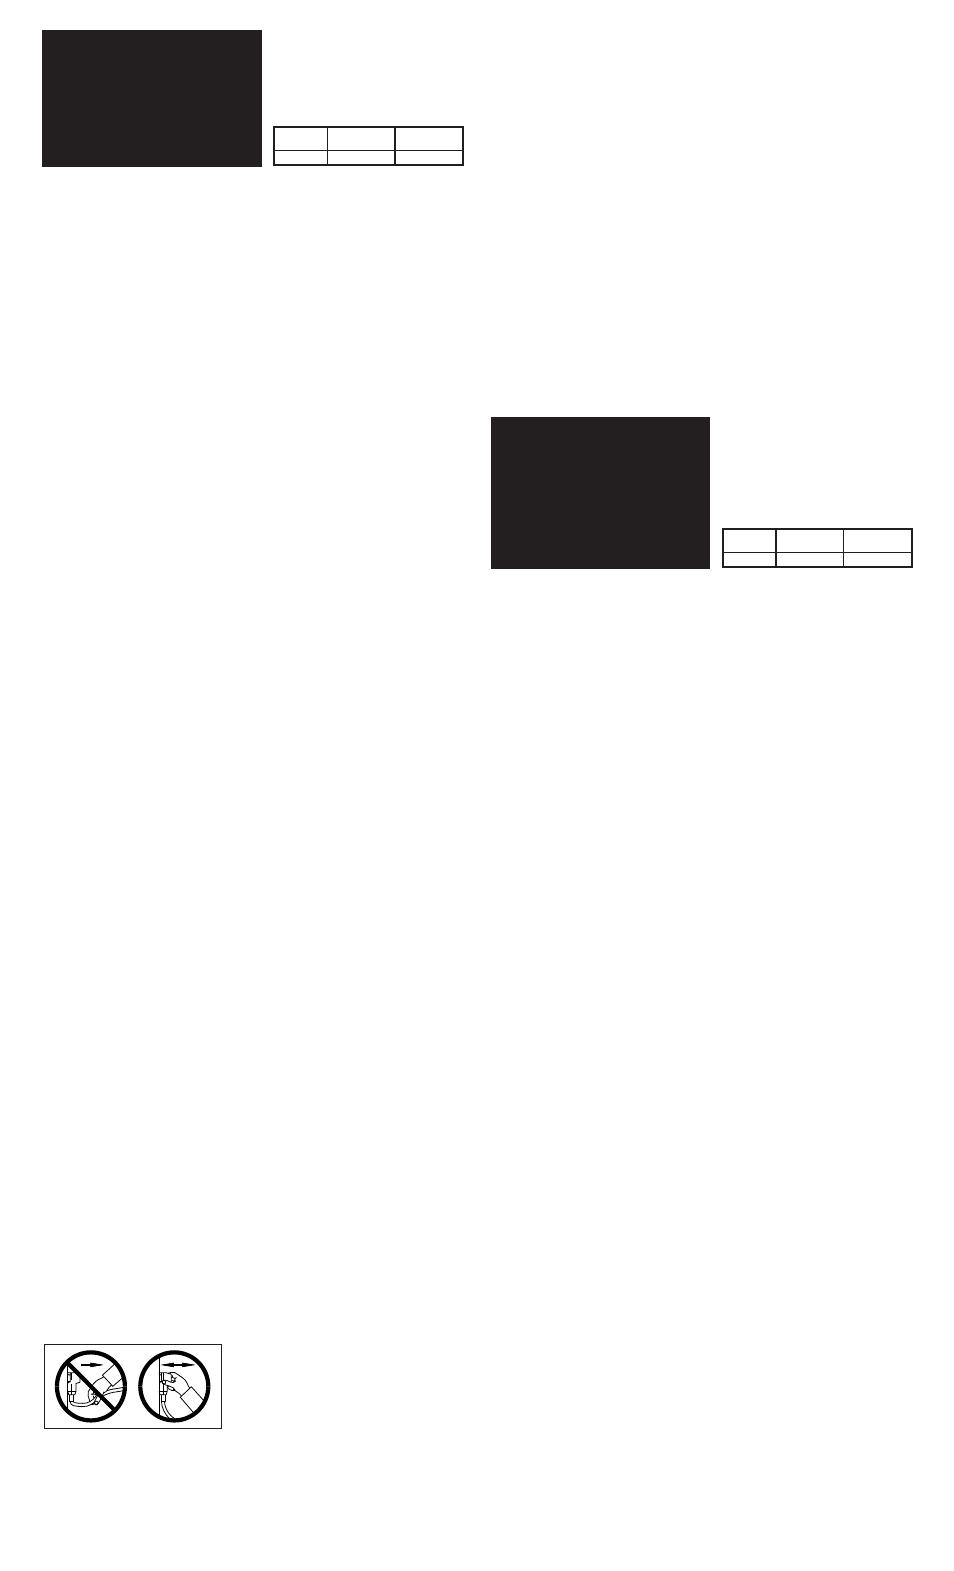 Legrand 1594csa Portable Ground Fault Circuit Interrupter Gfci Groundfault Background Image